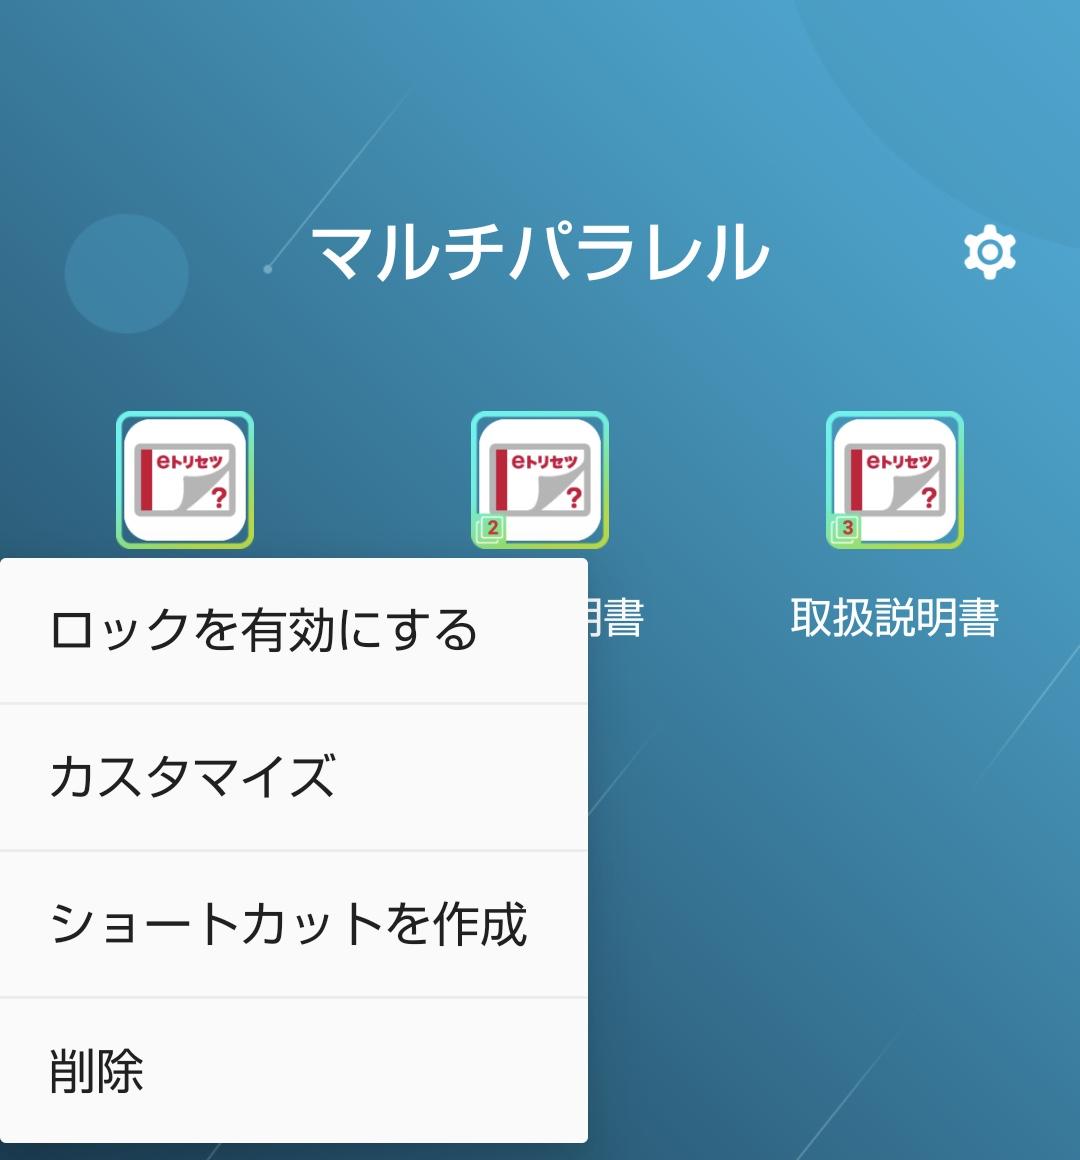 f:id:koiwai_chinatsu:20191225143722j:plain